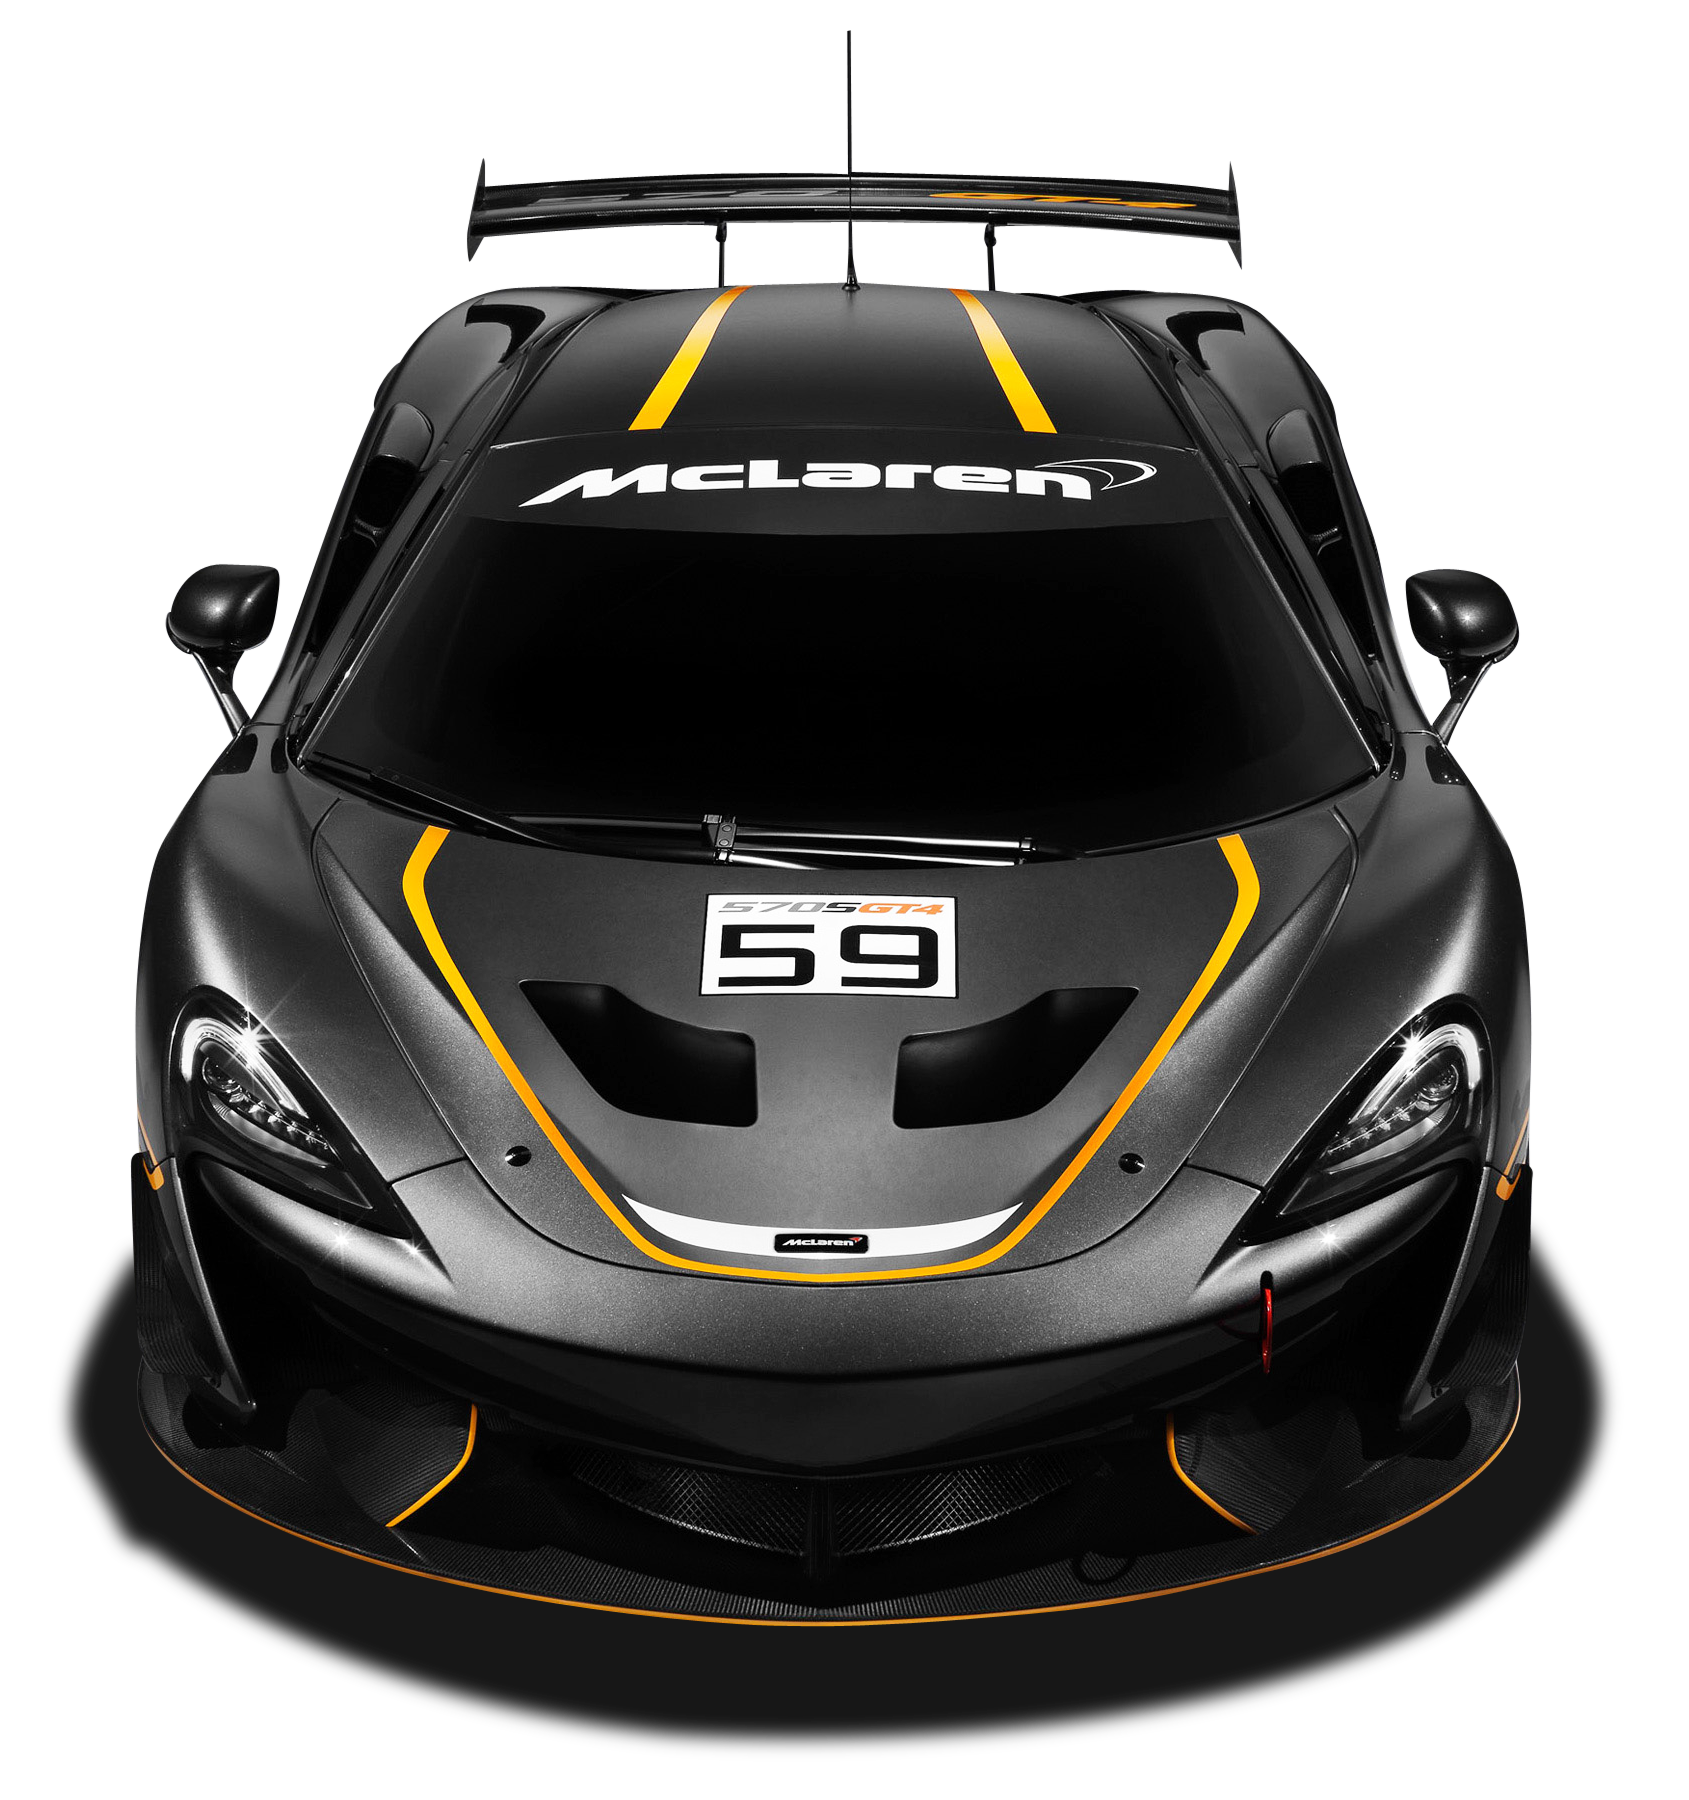 Black Mclaren 570s GT4 Race Car